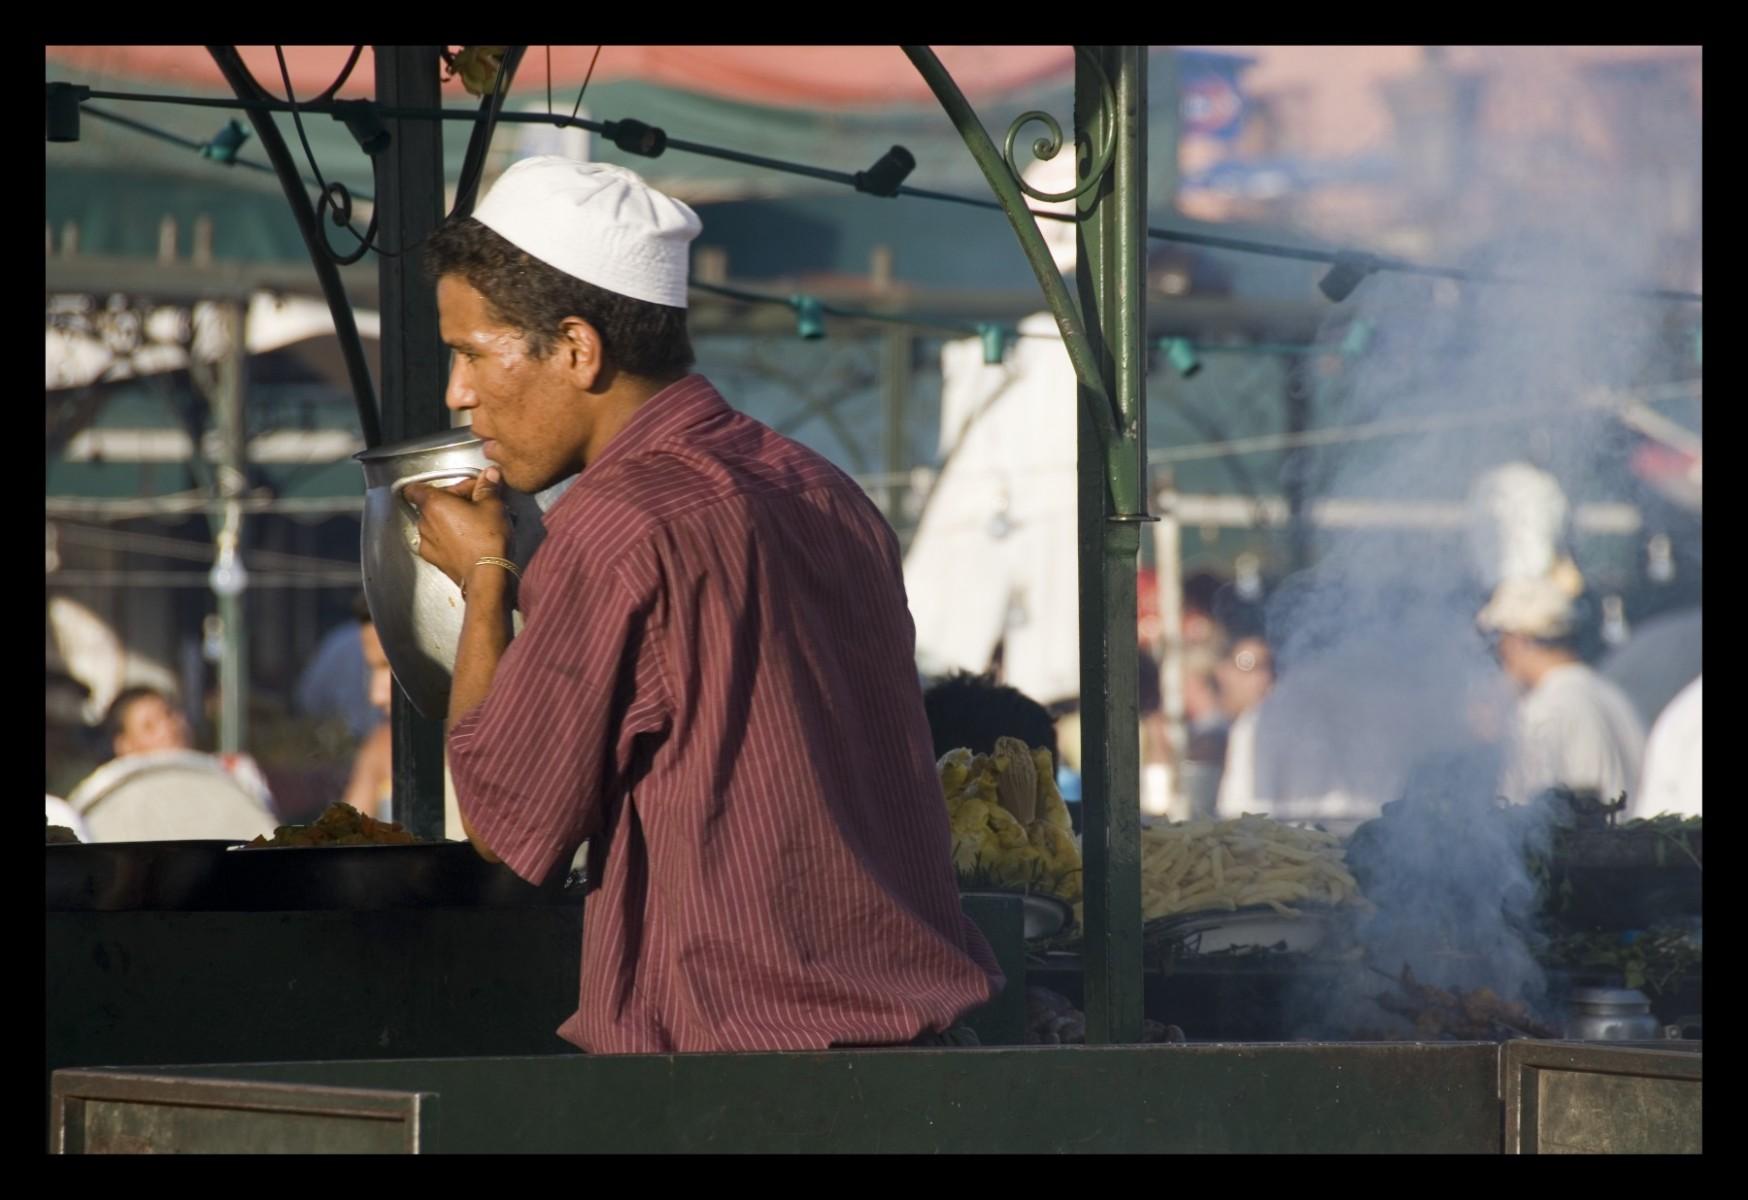 88614_DSC0137-jamal-el-fna-food-vendor Storie di Luce